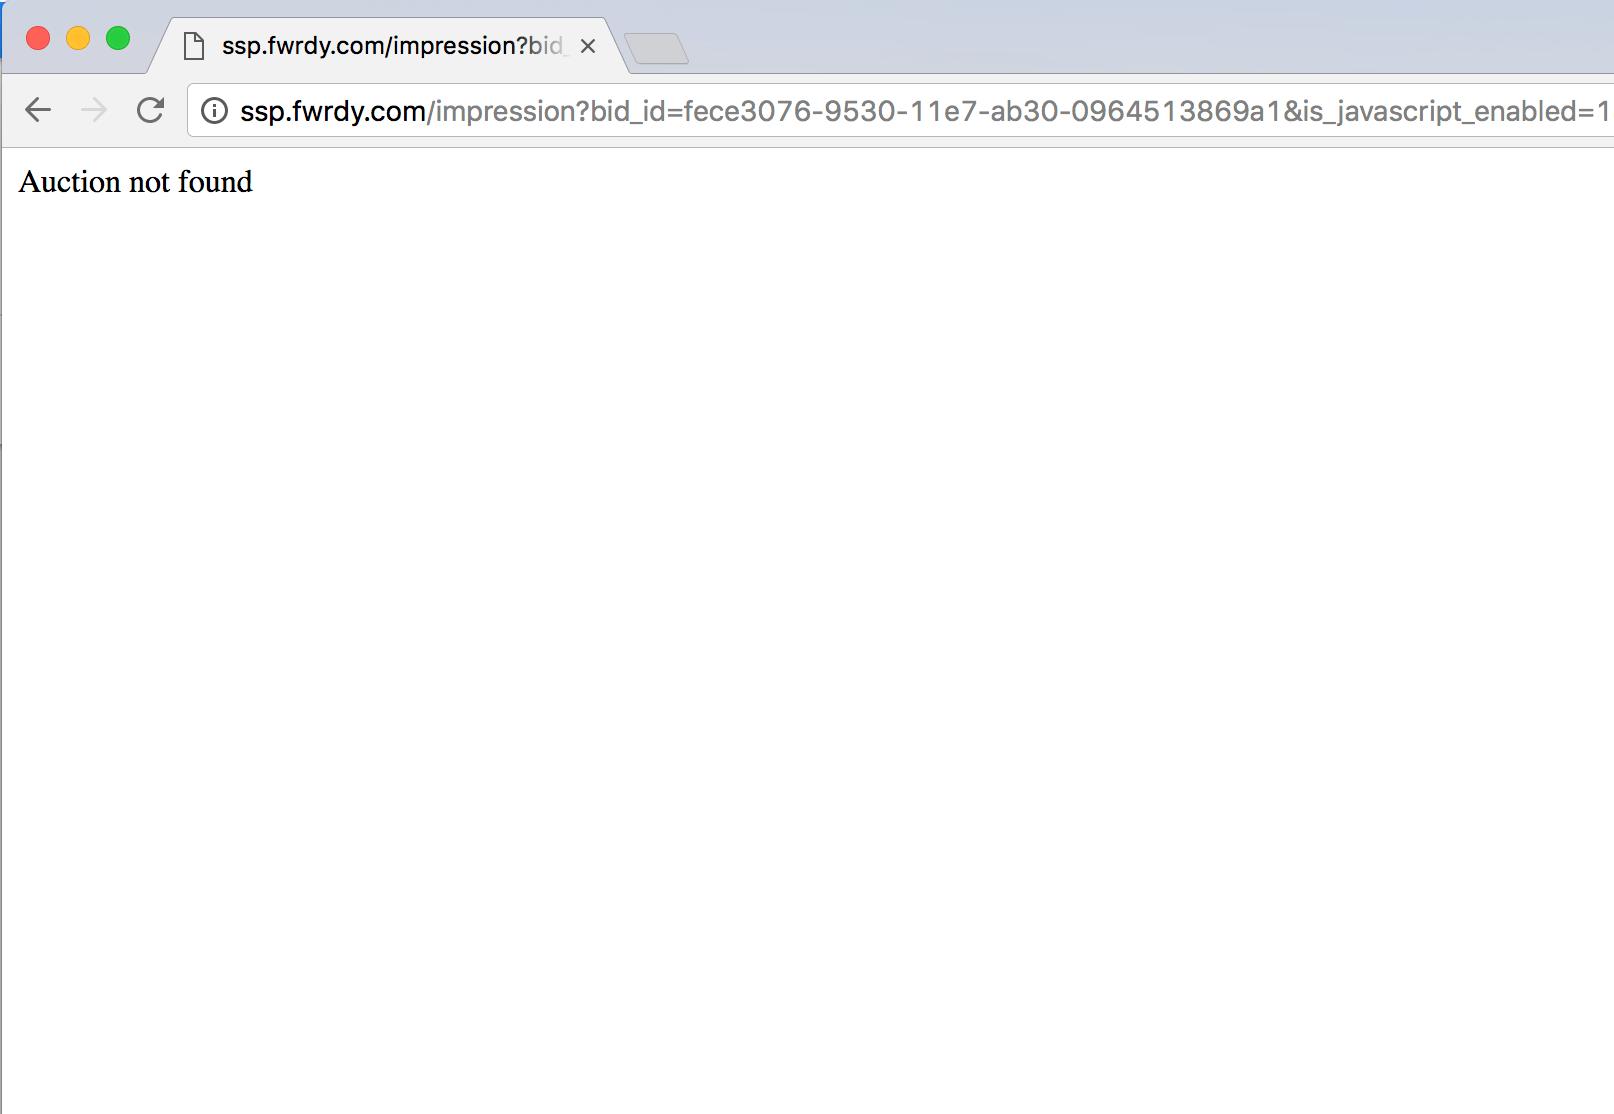 ssp.fwrdy.com redirect